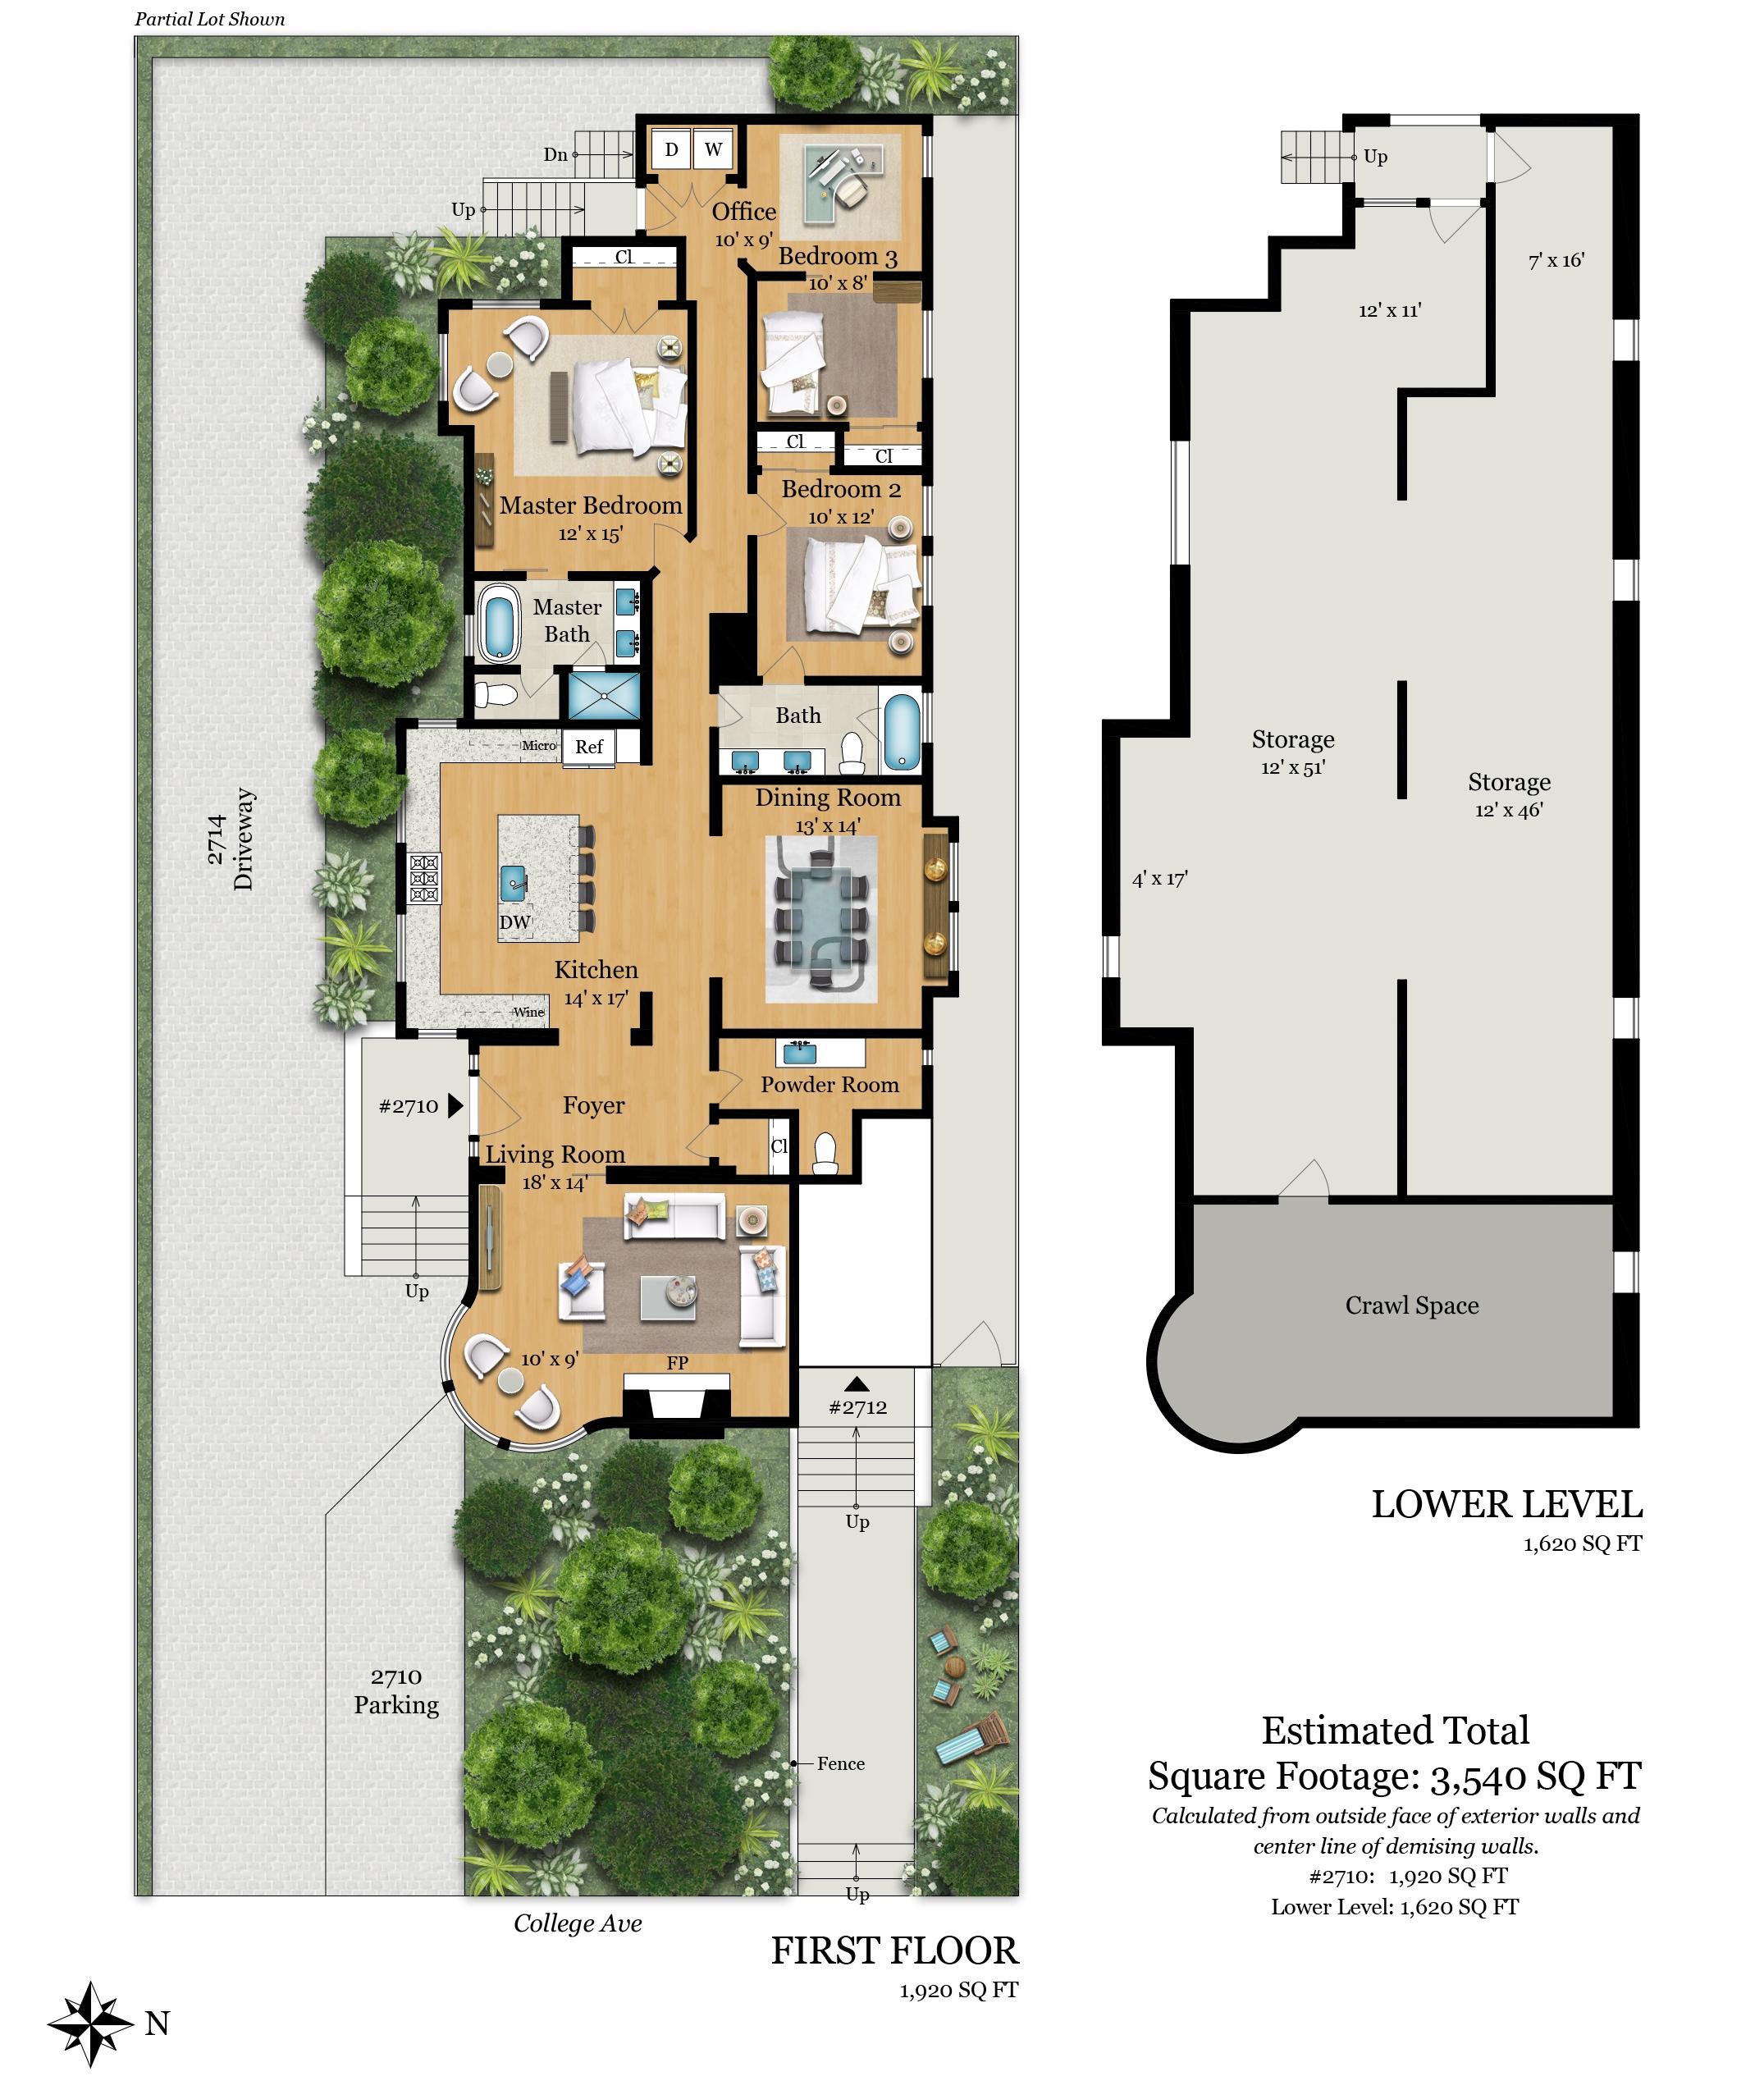 JM-2710CollegeAve-FloorPlan-Print-R1.jpg